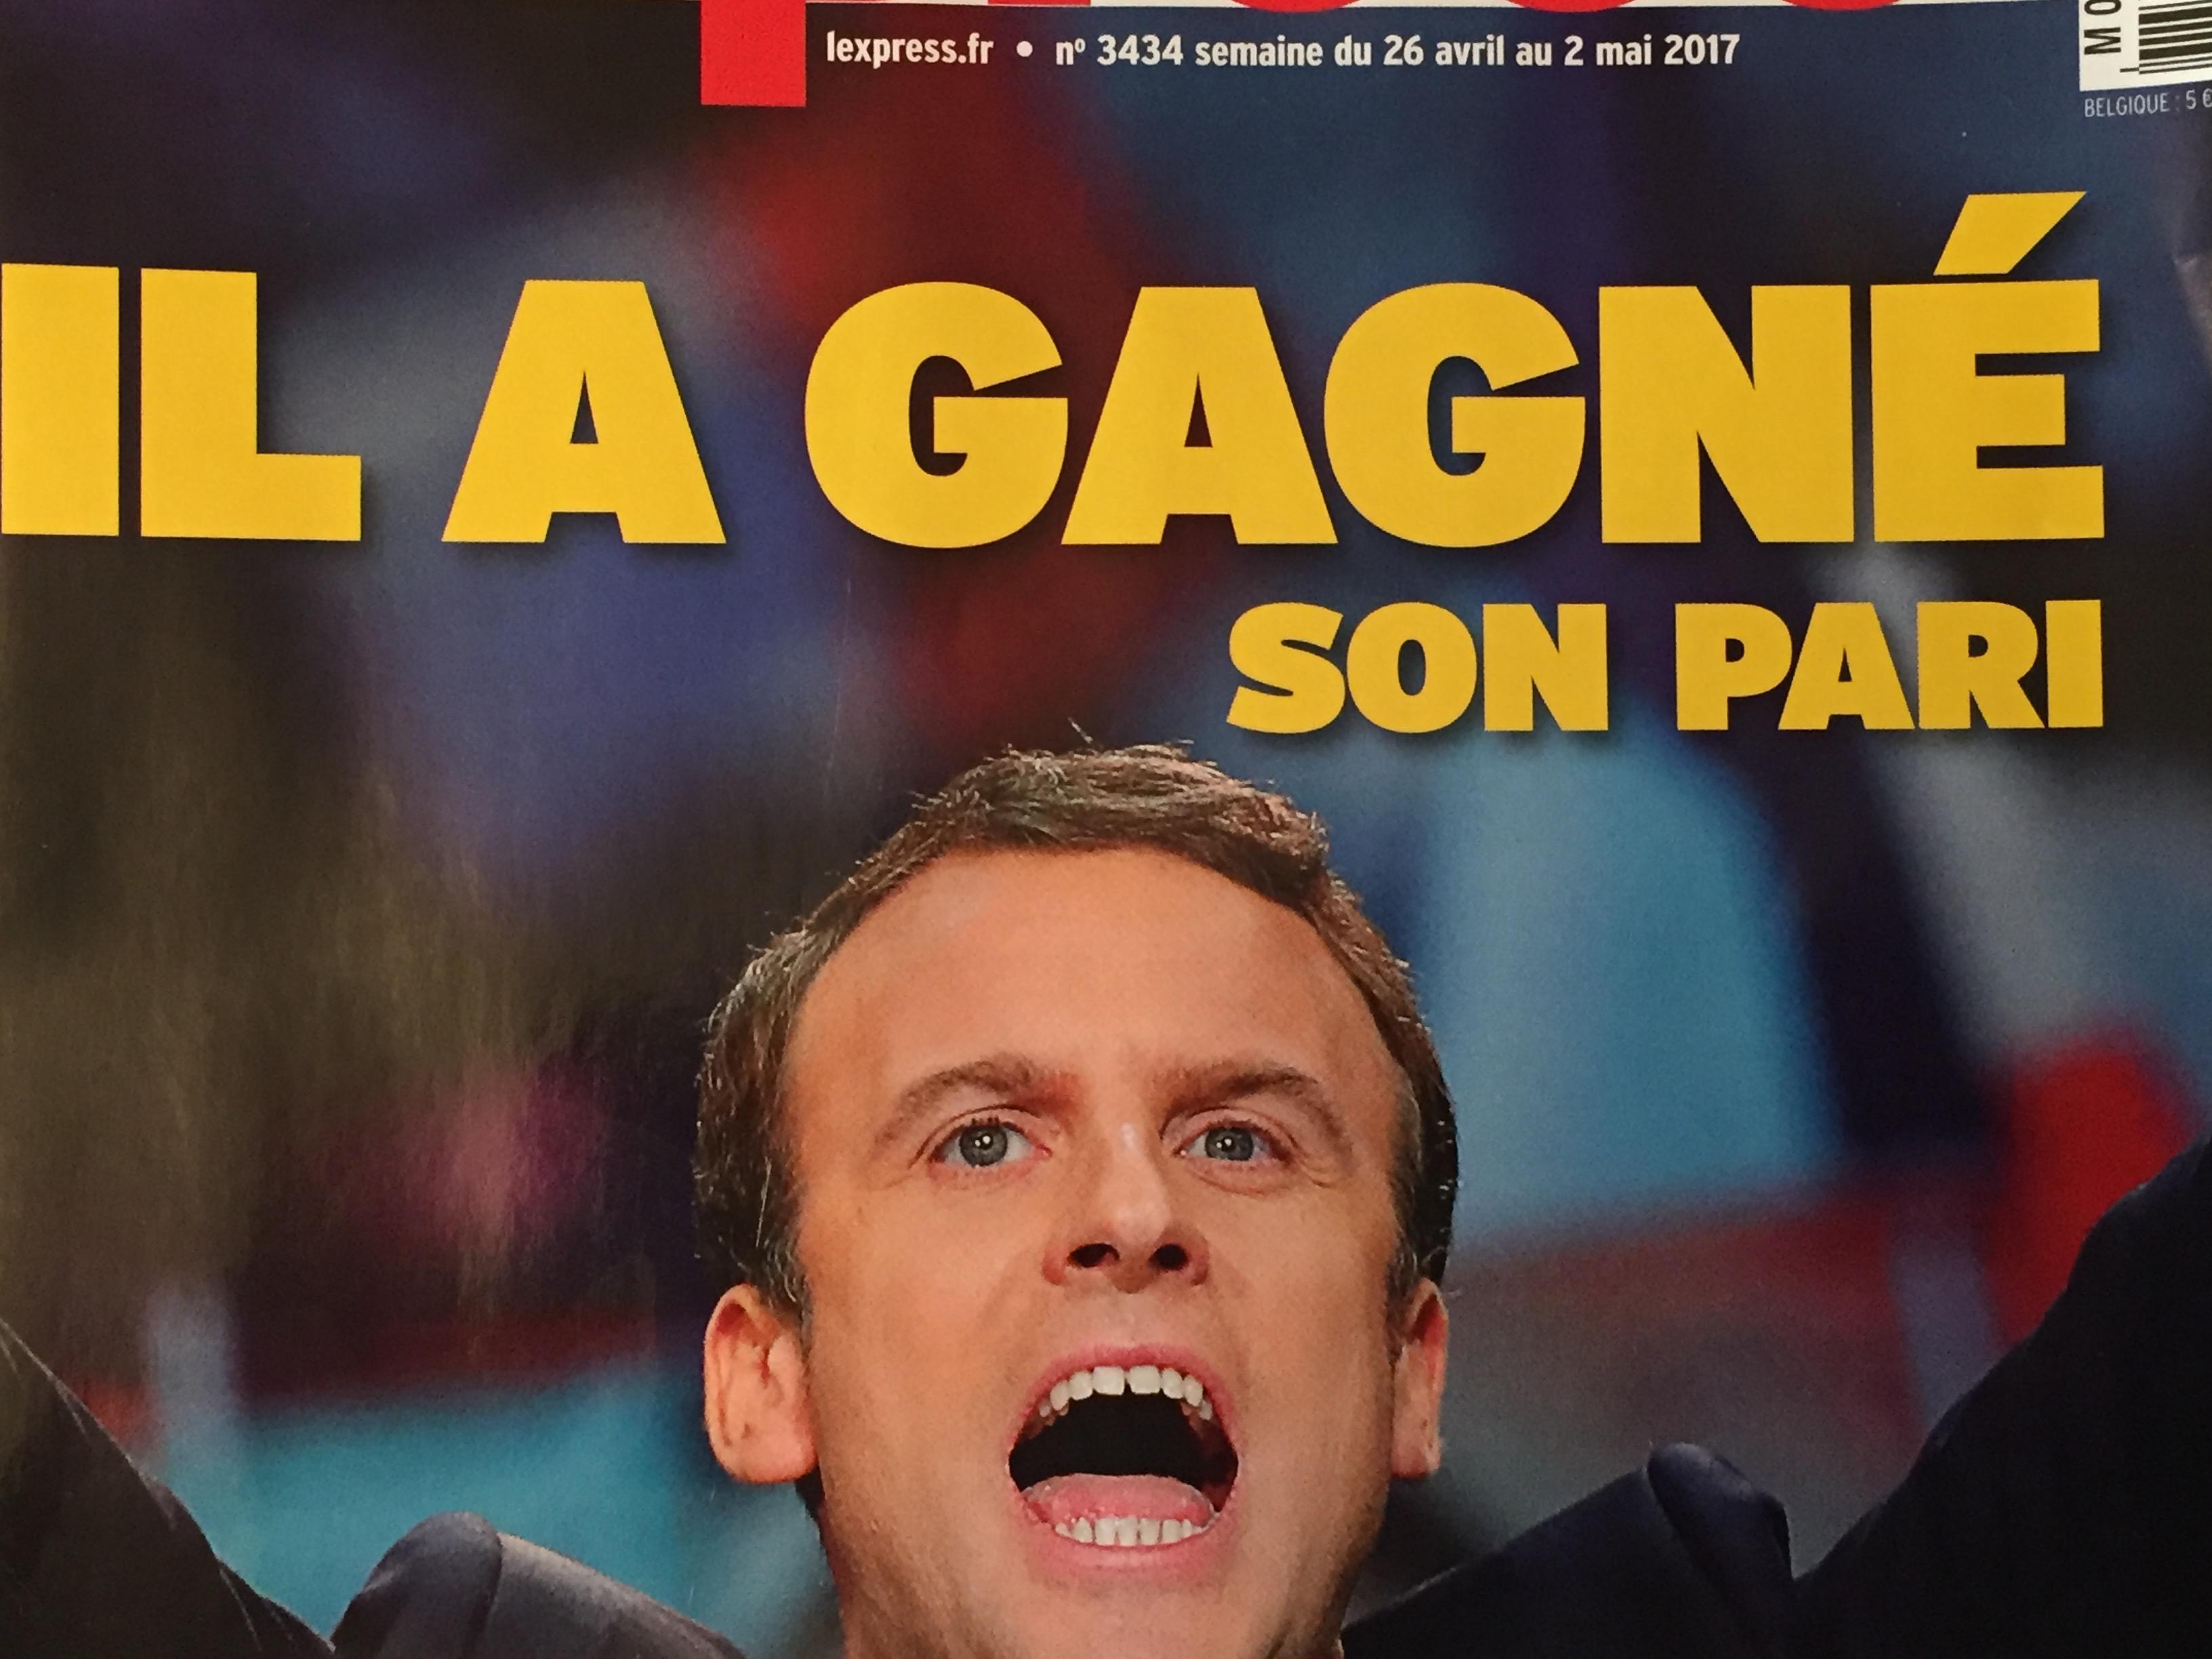 Marine Le Pen-Macron